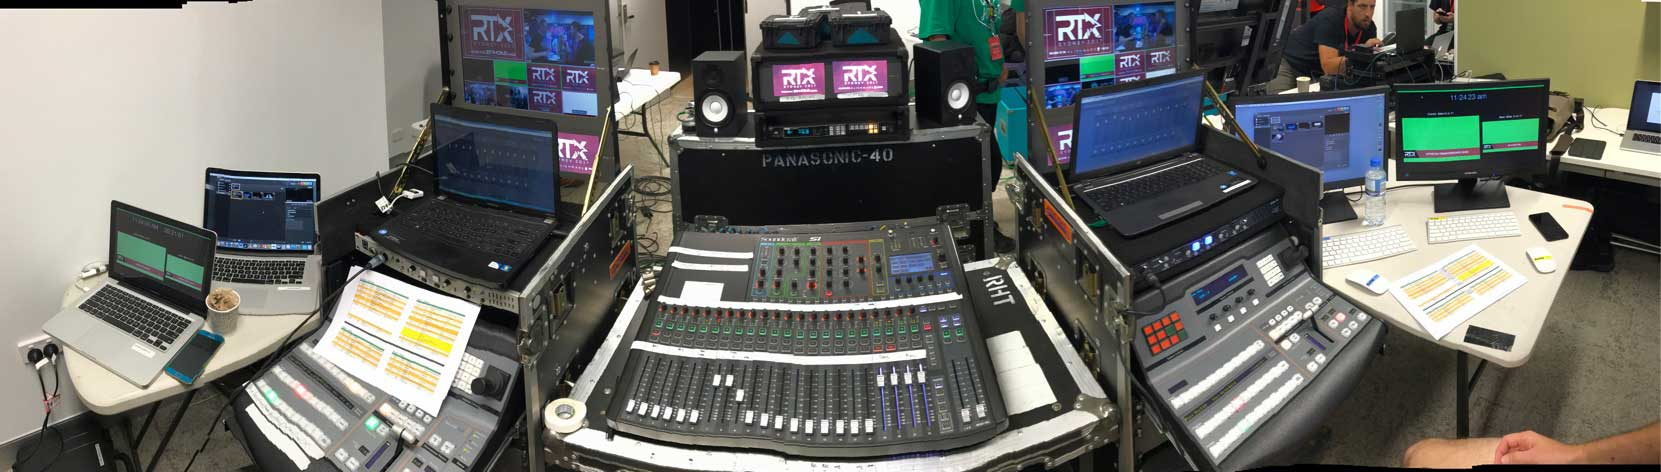 RTX Sydney 2017